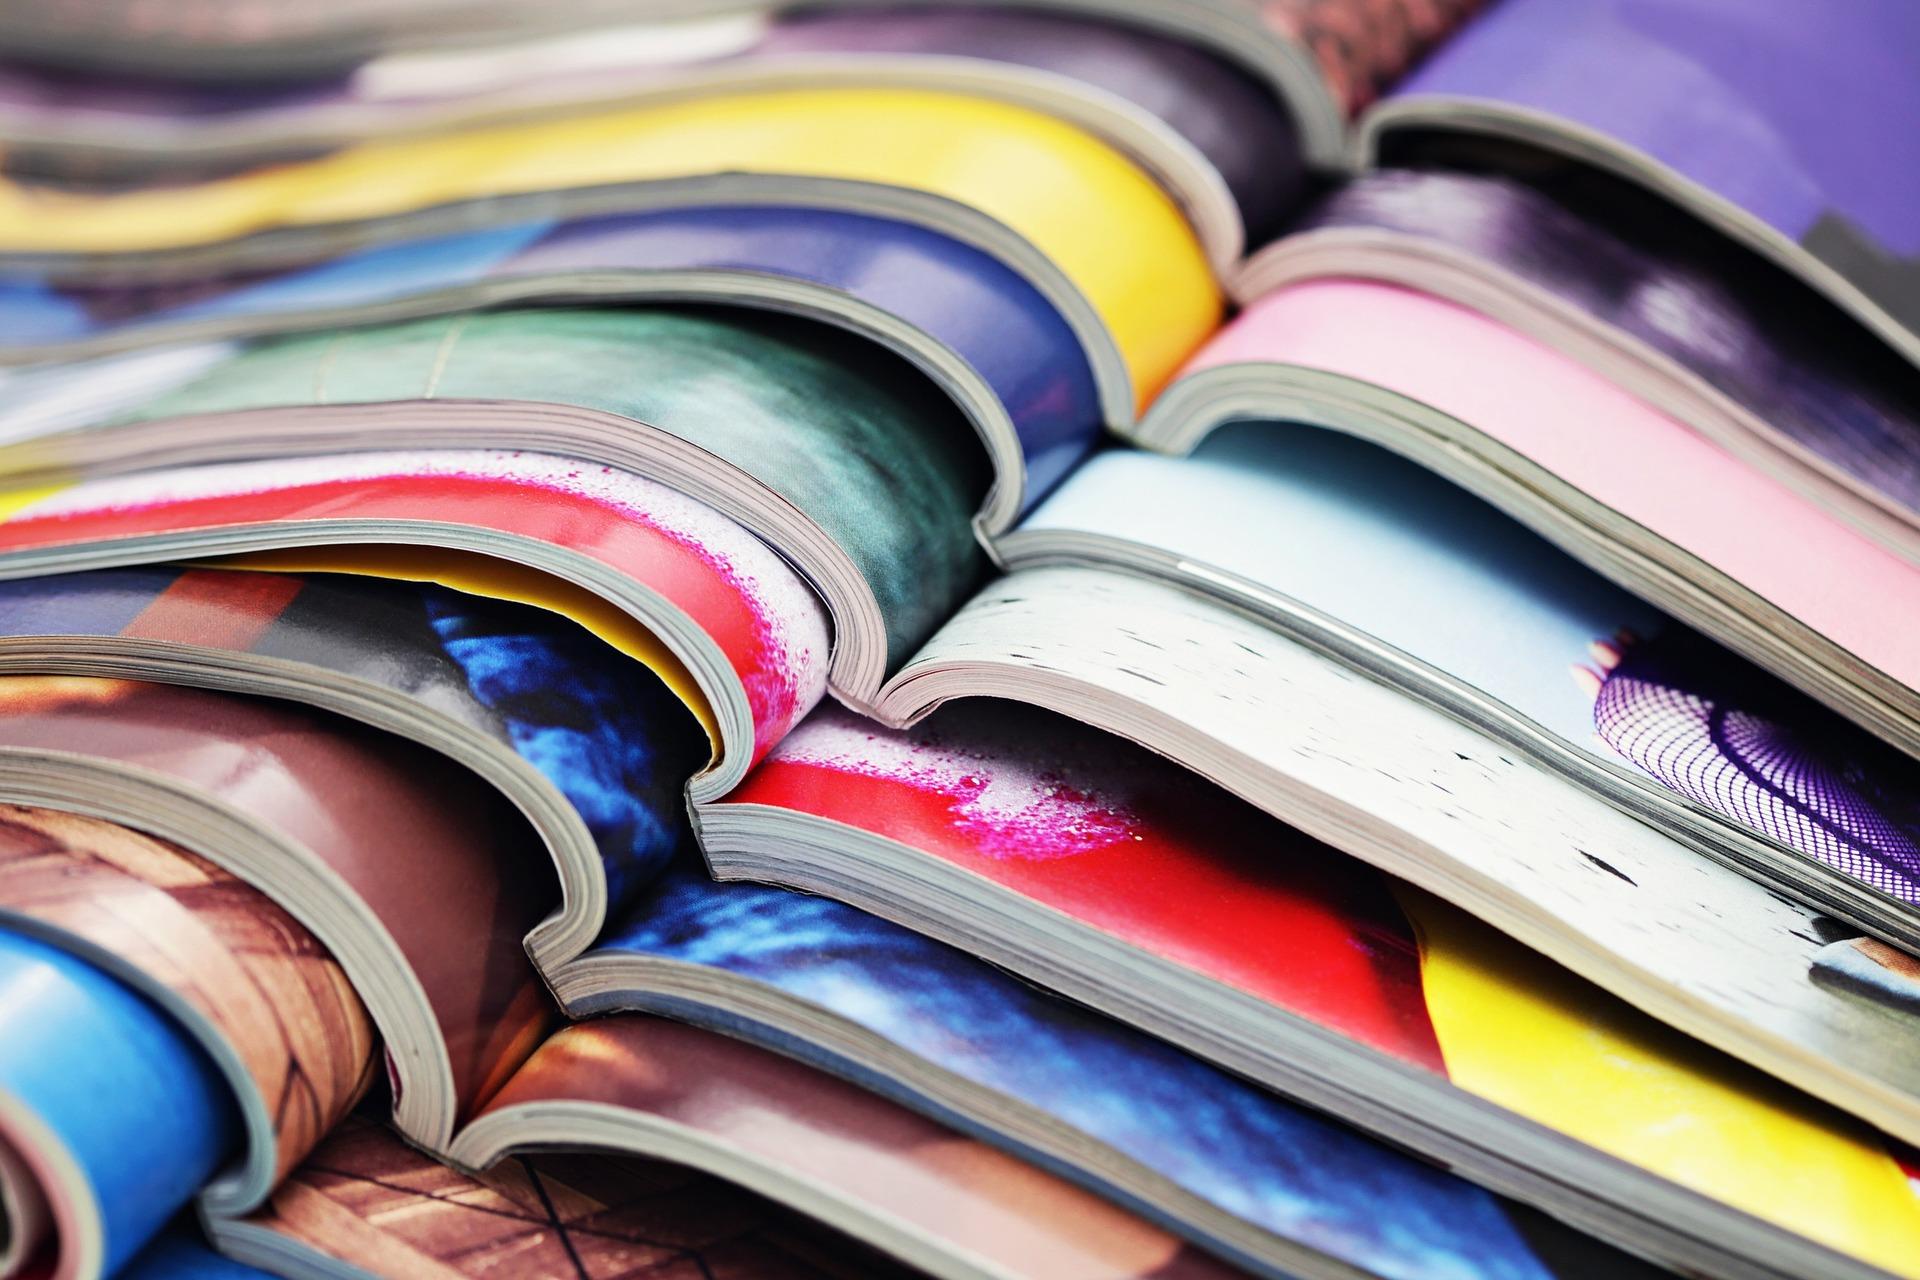 magazine-806073_1920_1556680691862.jpg